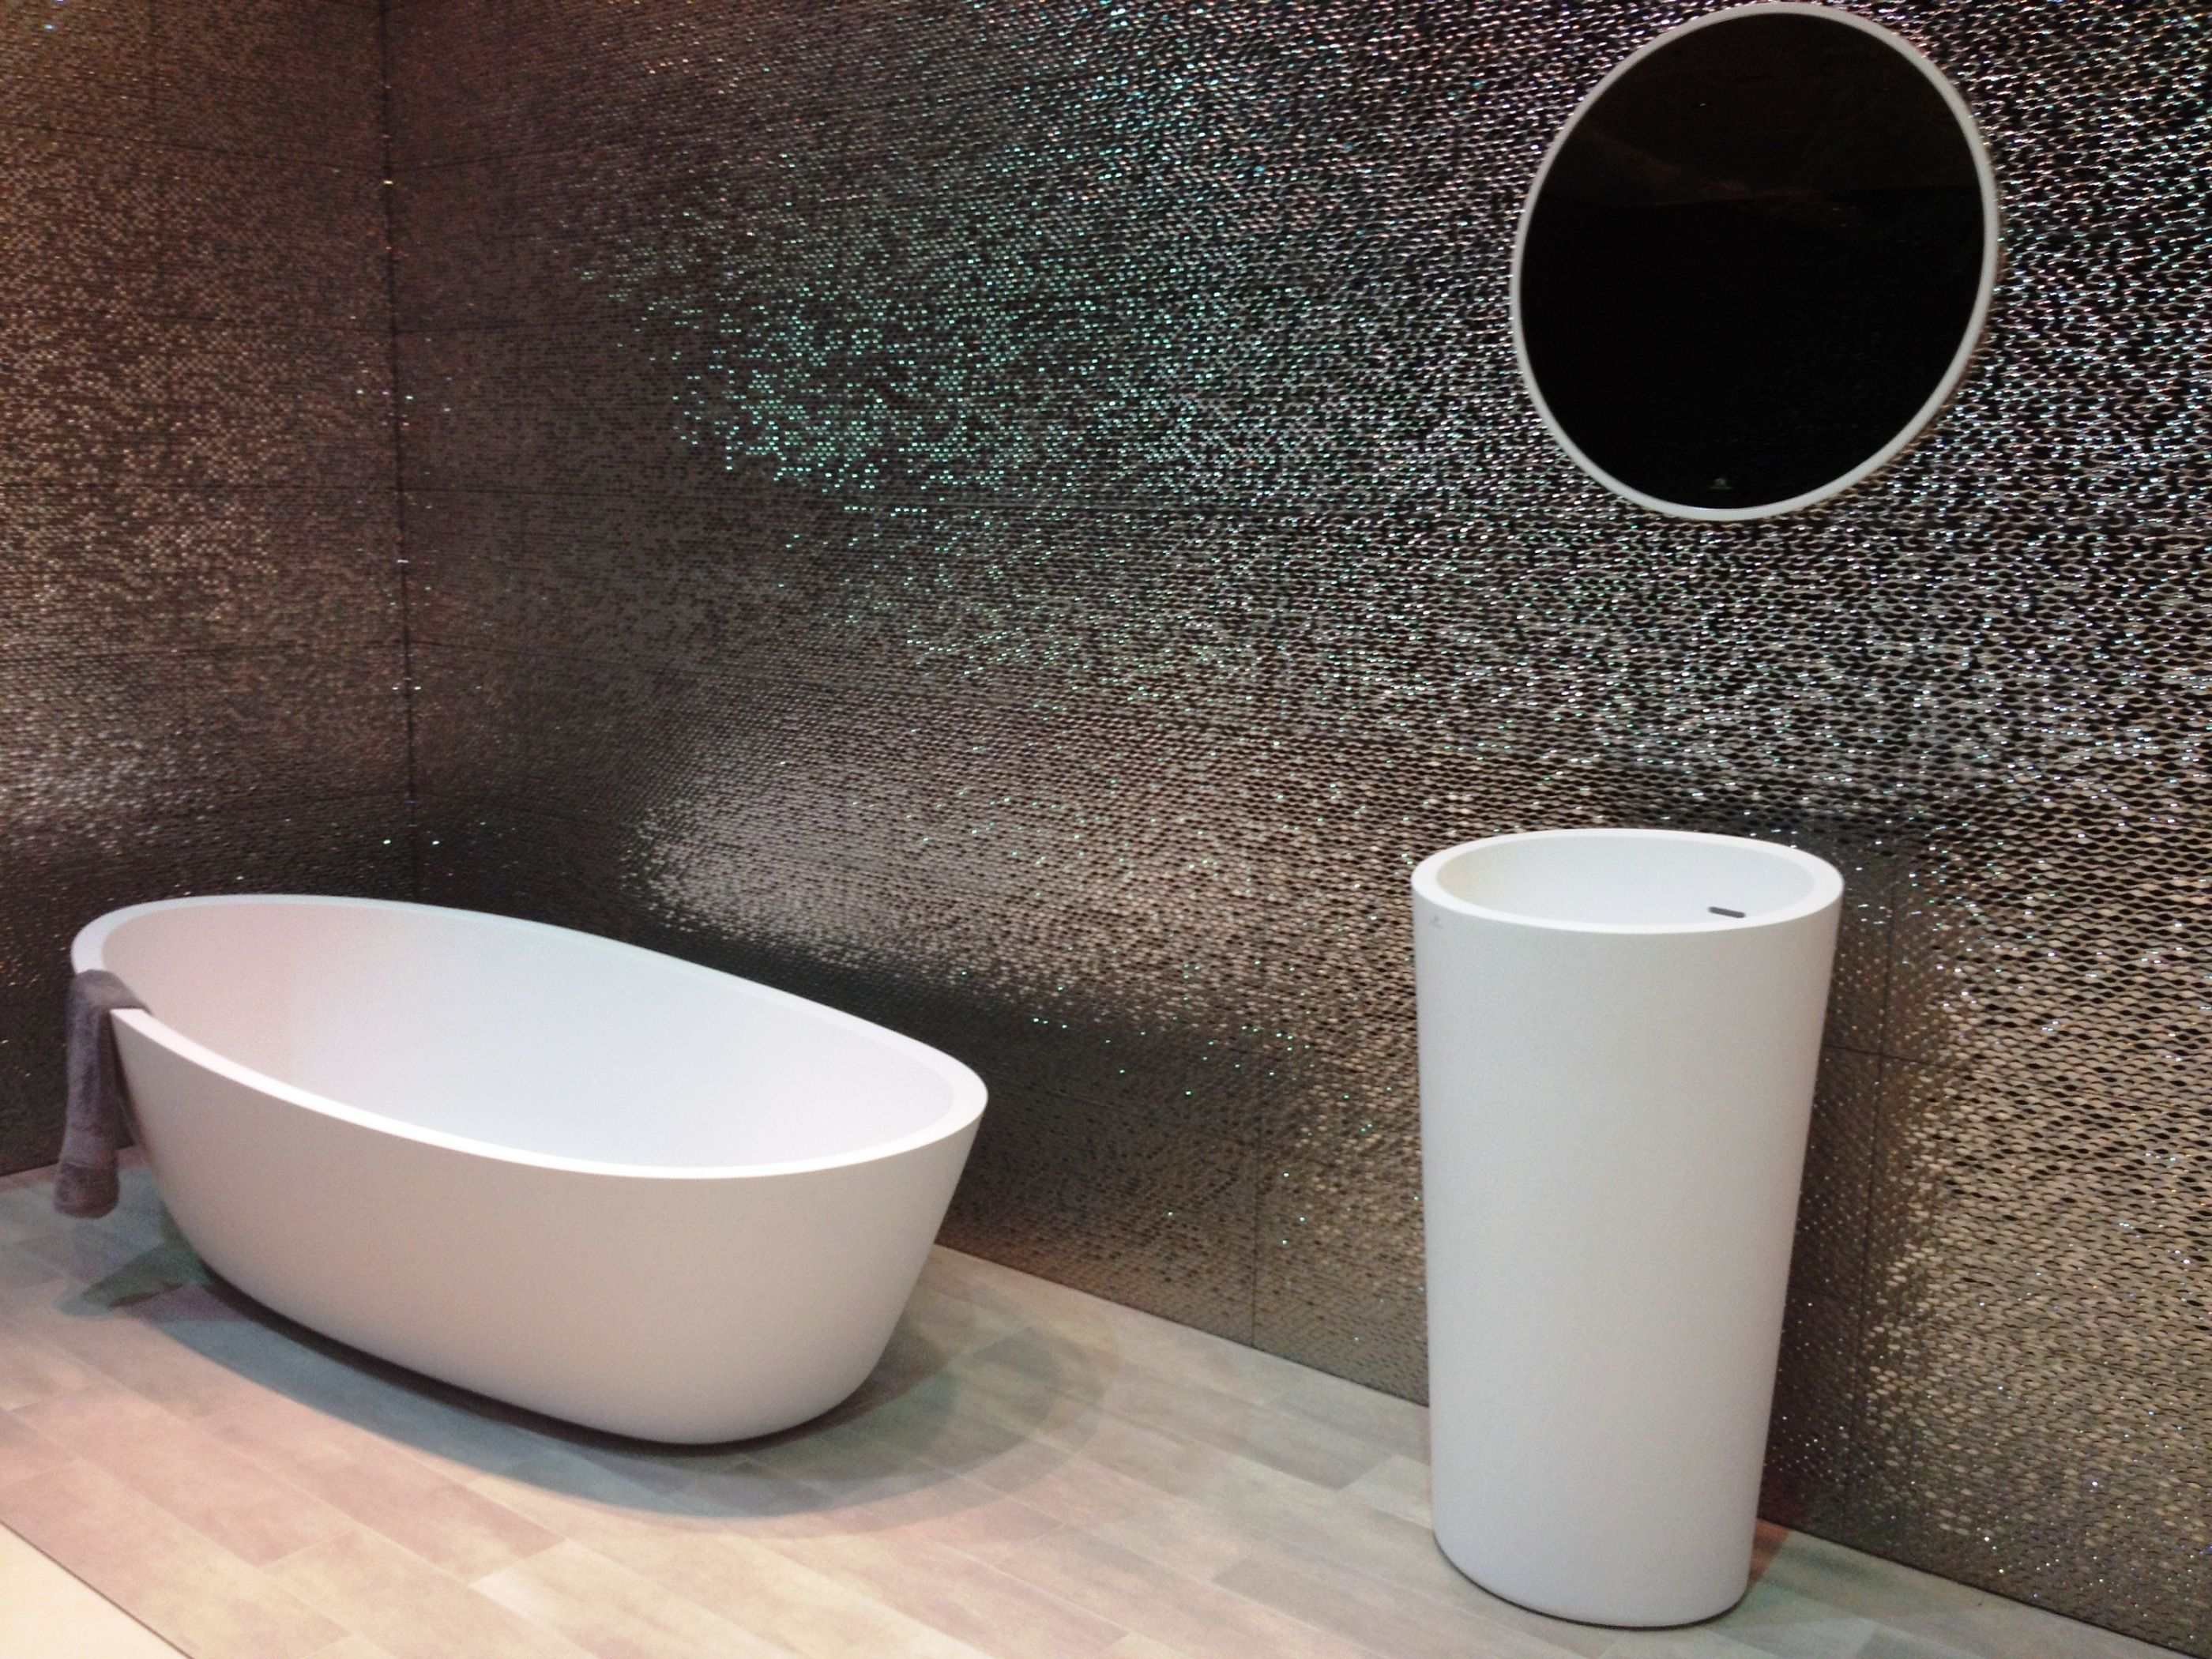 Bathroom Tiles Porcelanosa porcelanosa tiles | westside tile and stone | wnętrza łazienka